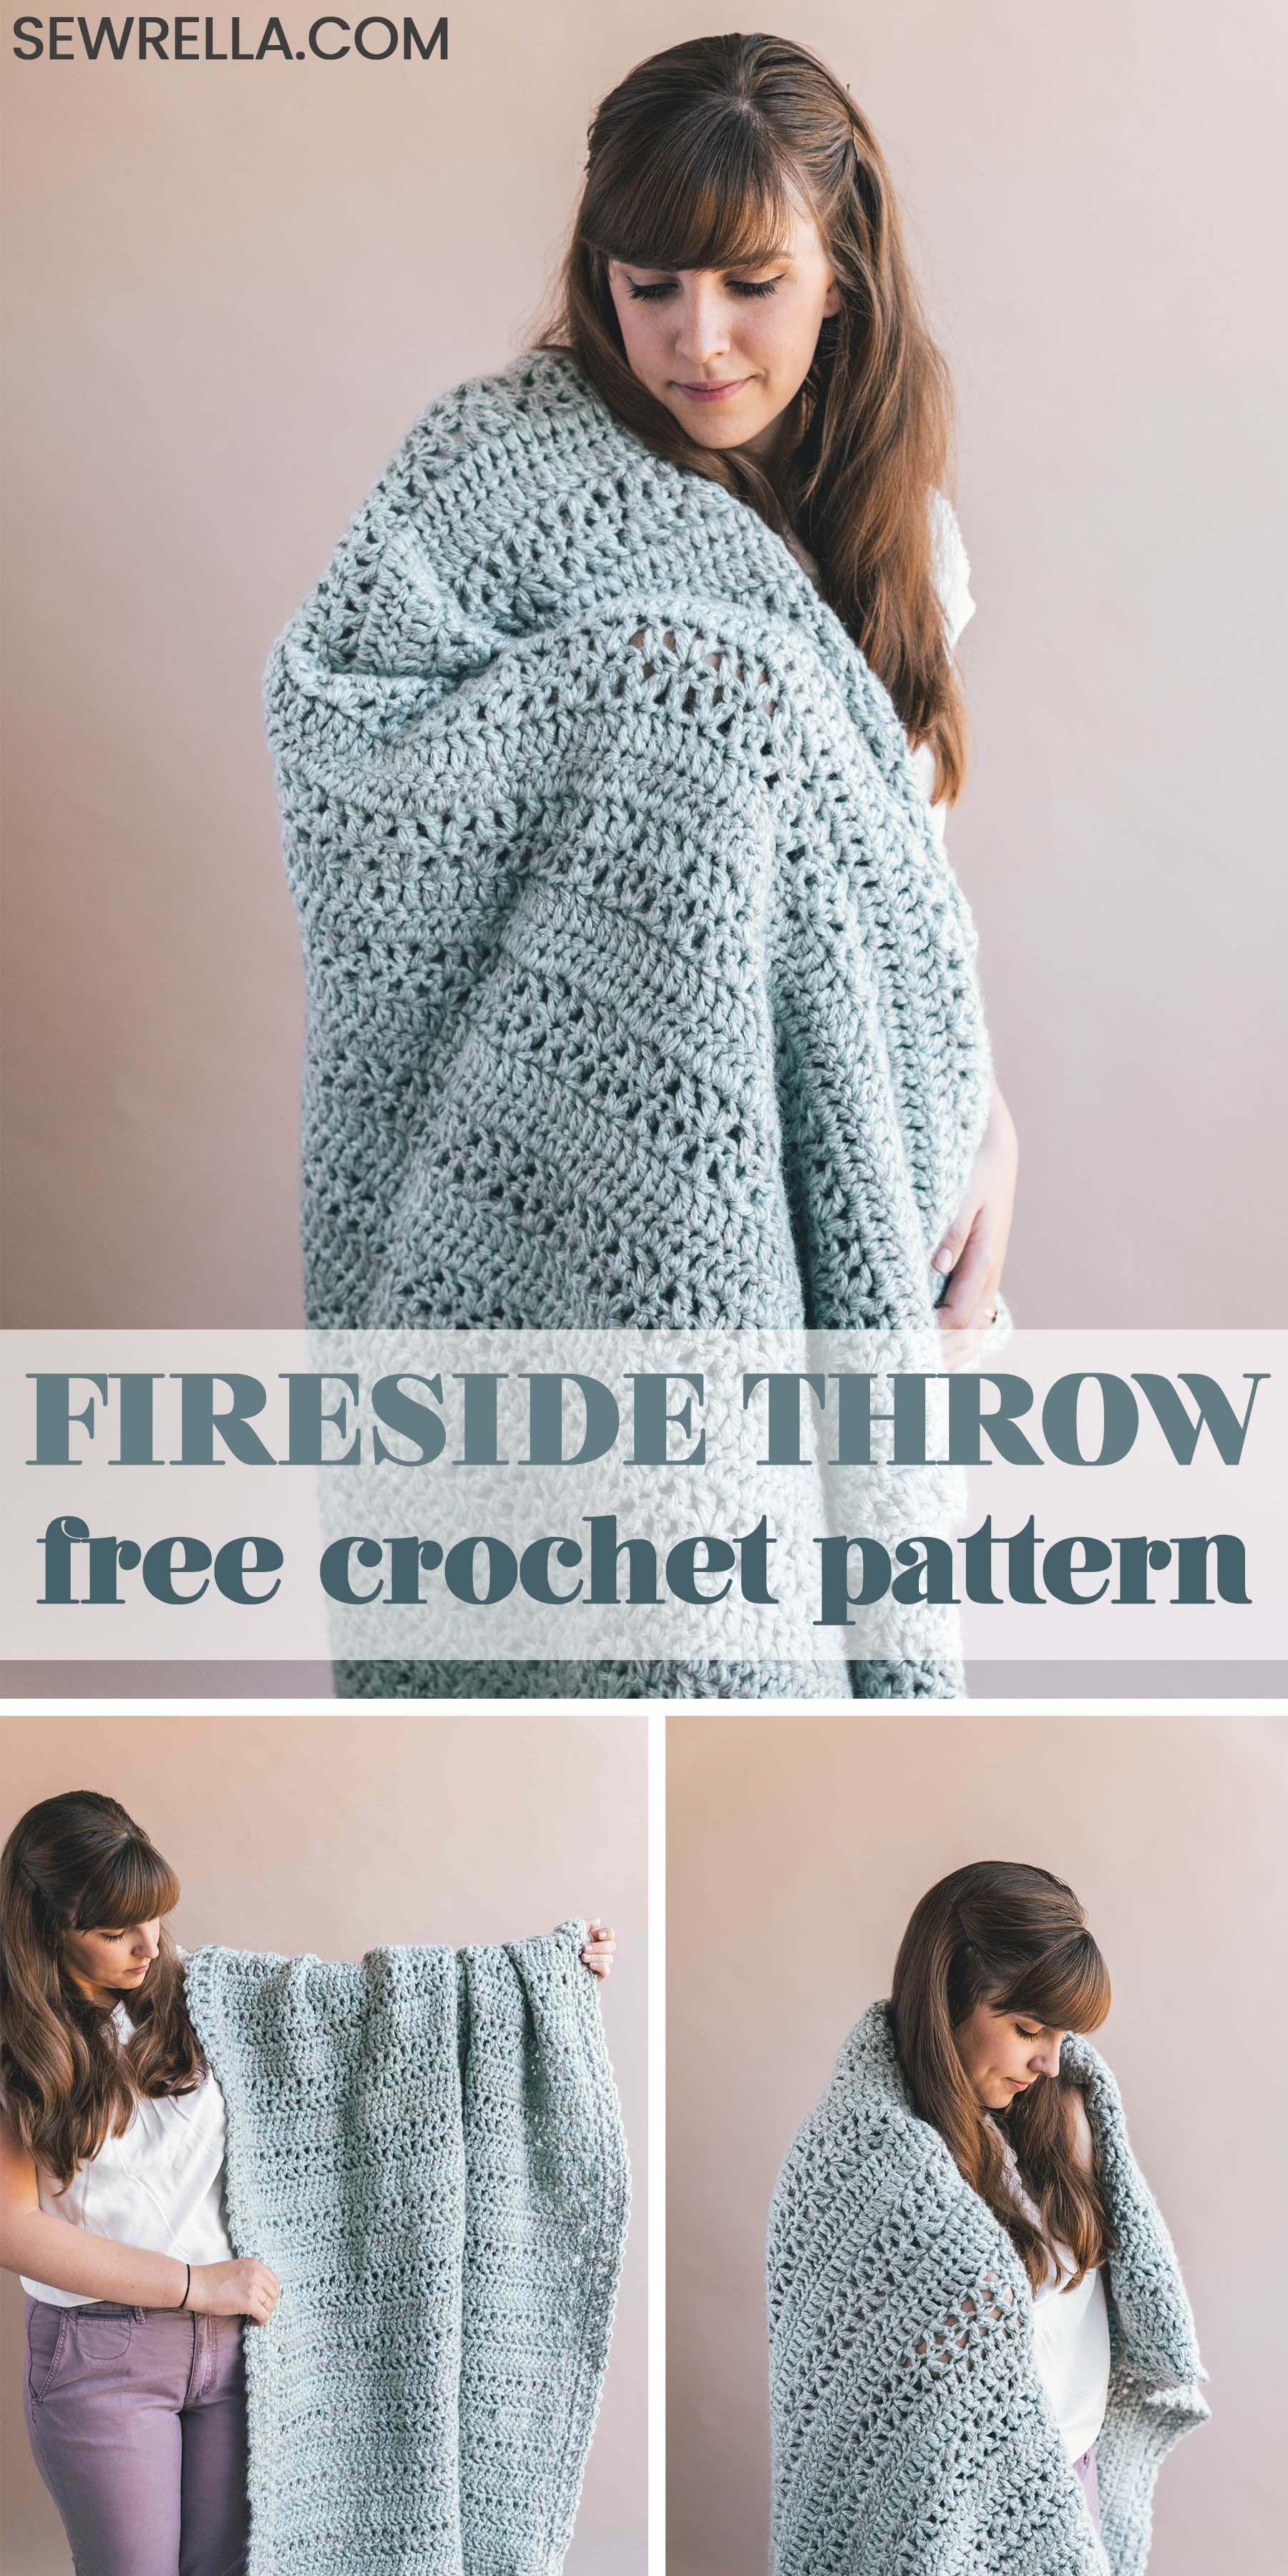 Crochet Fireside Throw • Sewrella